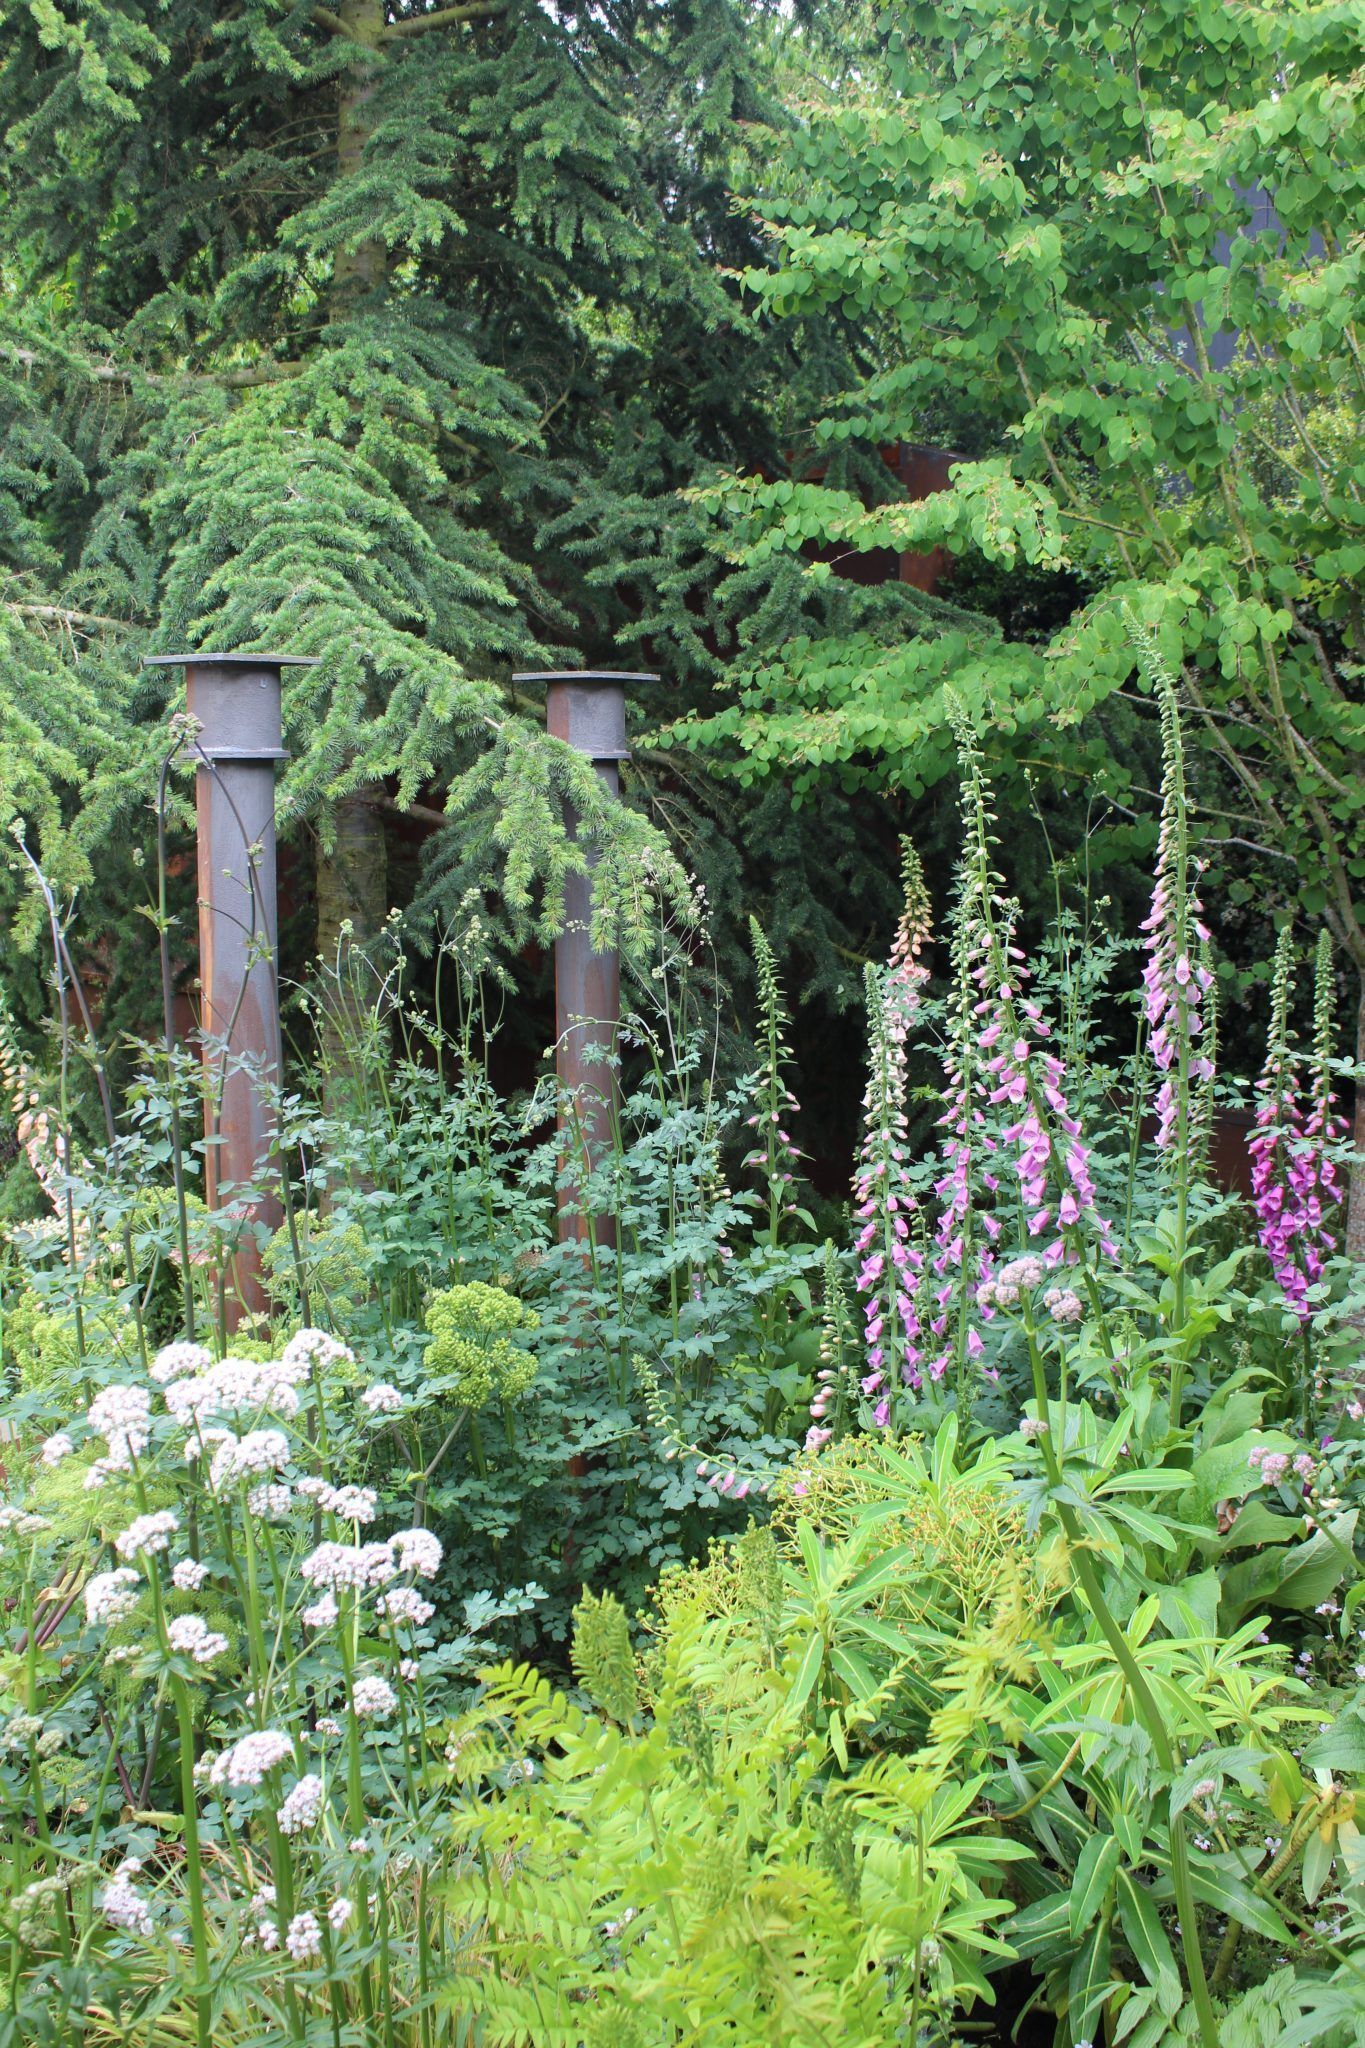 14 Things At Rhs Chelsea Flower Show 2019 Jack Wallington Garden